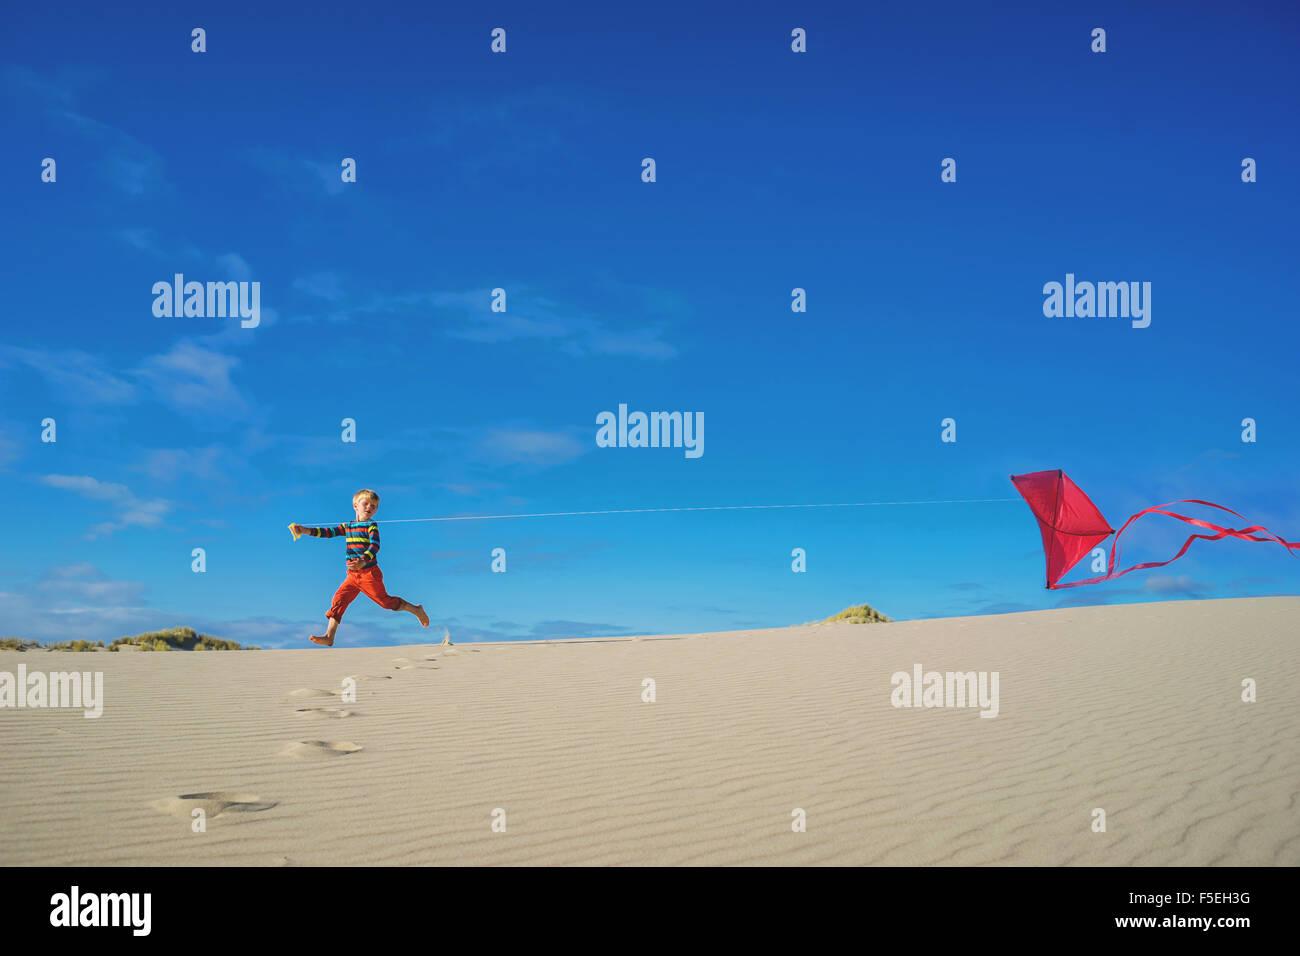 Enfant volant red kite on sandy beach Photo Stock